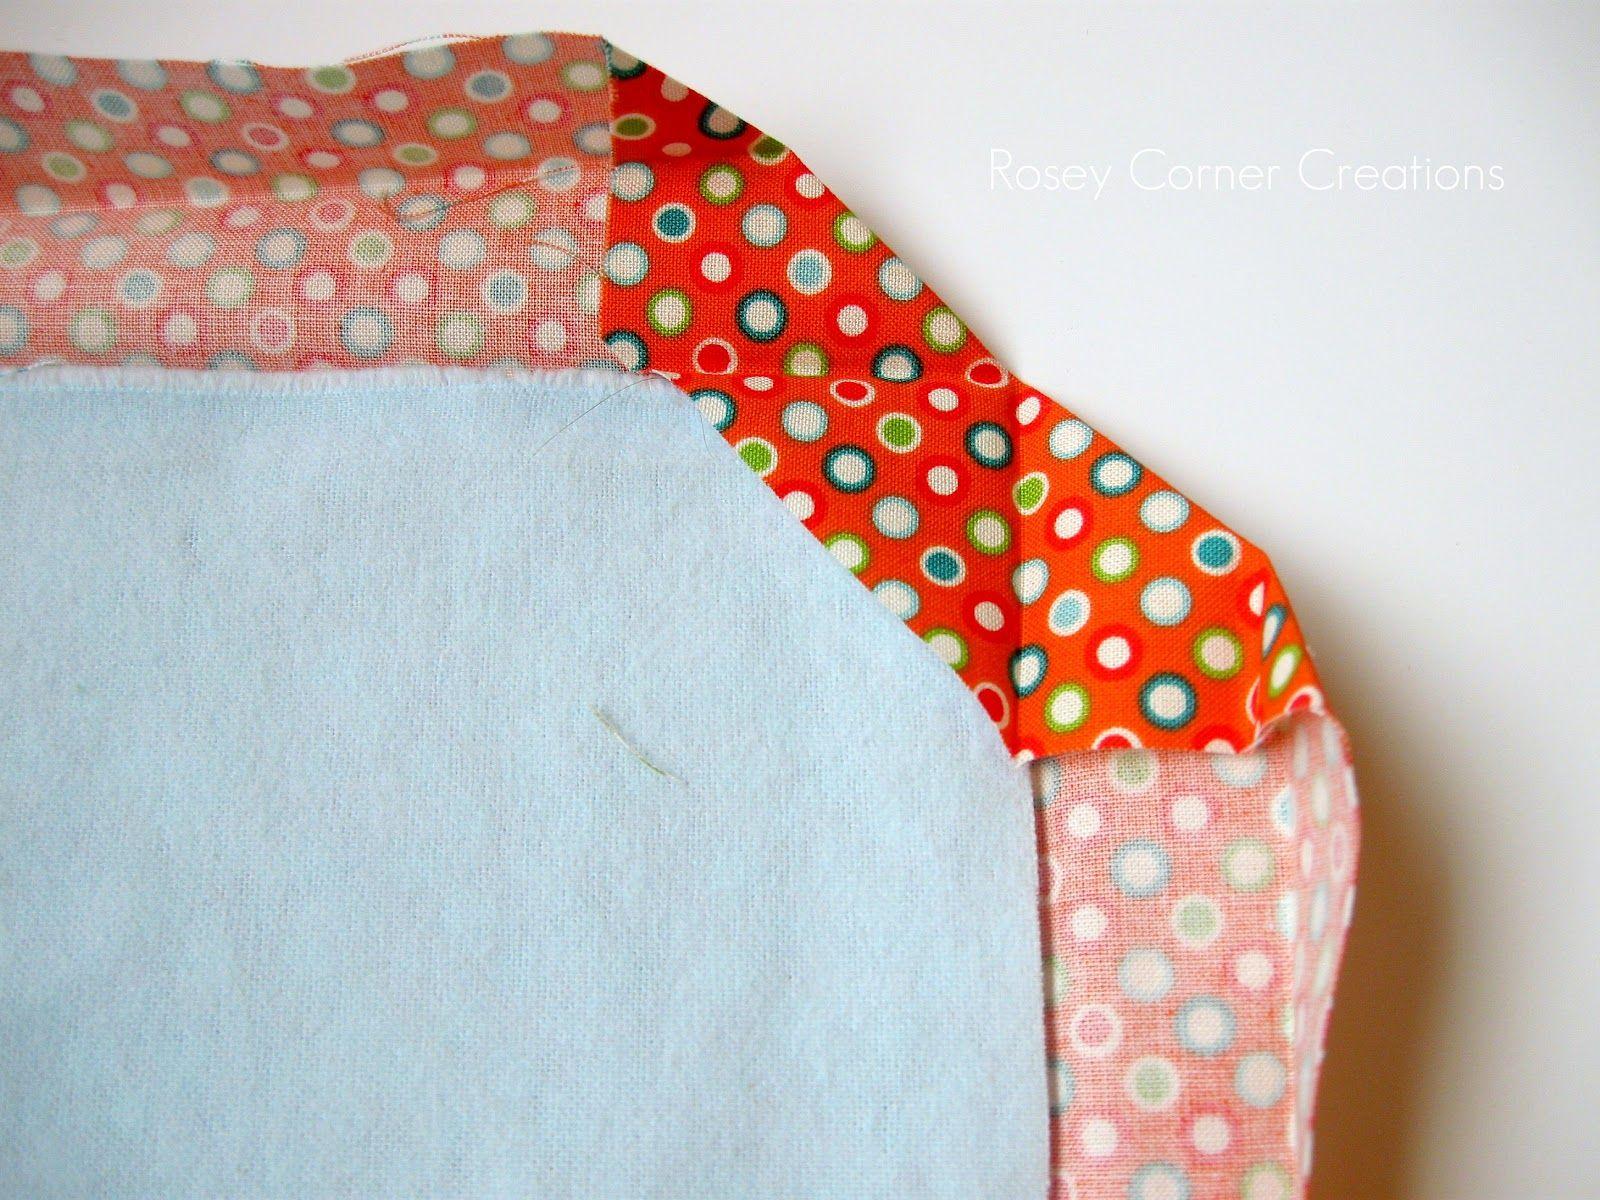 Headband Sewing Pattern Rosey Corner Creations Easy Easy